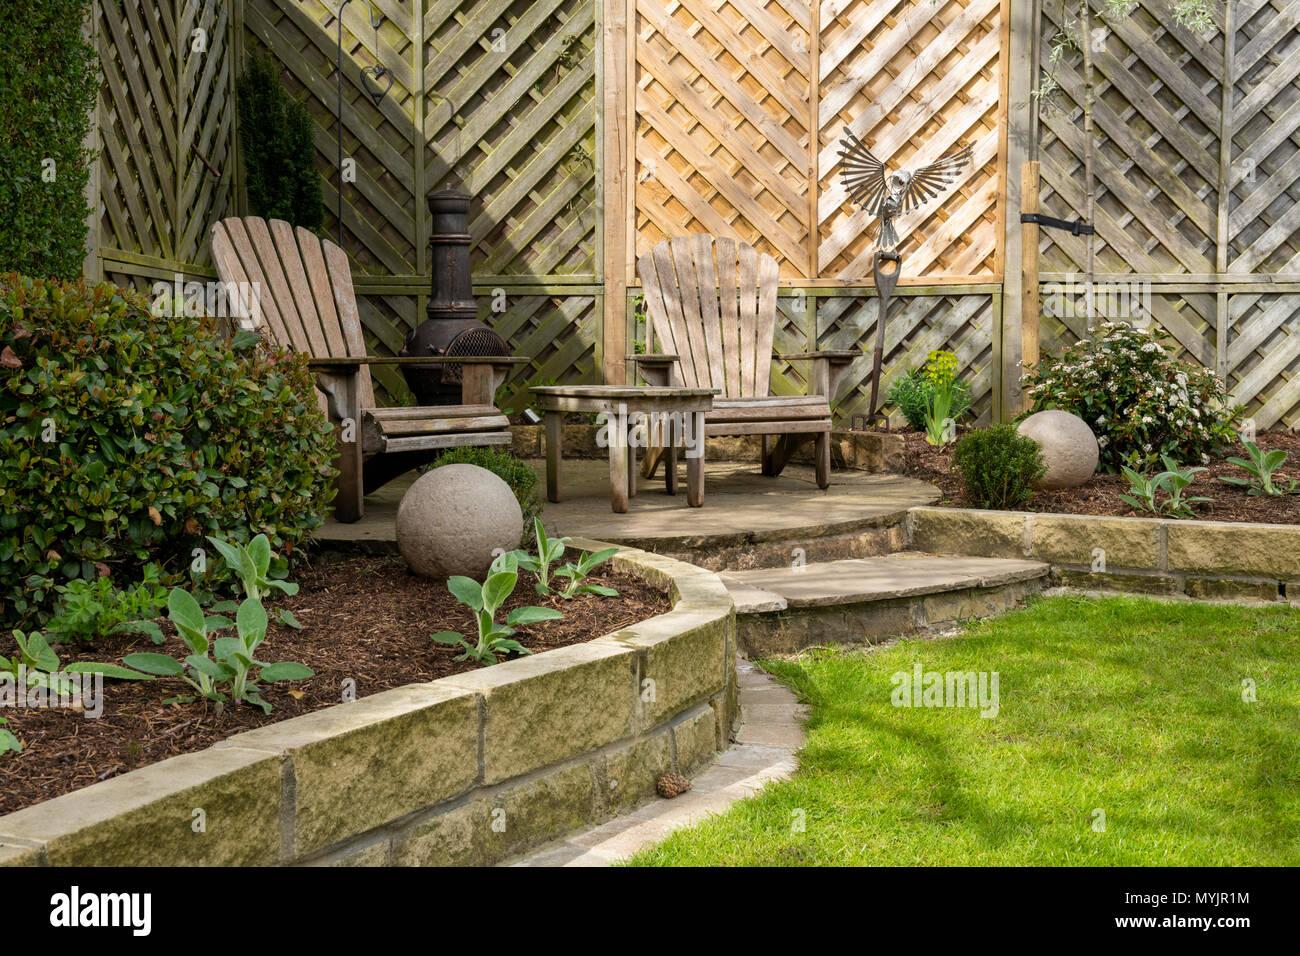 Belle, paysagé, jardin privé close-up avec un design ...